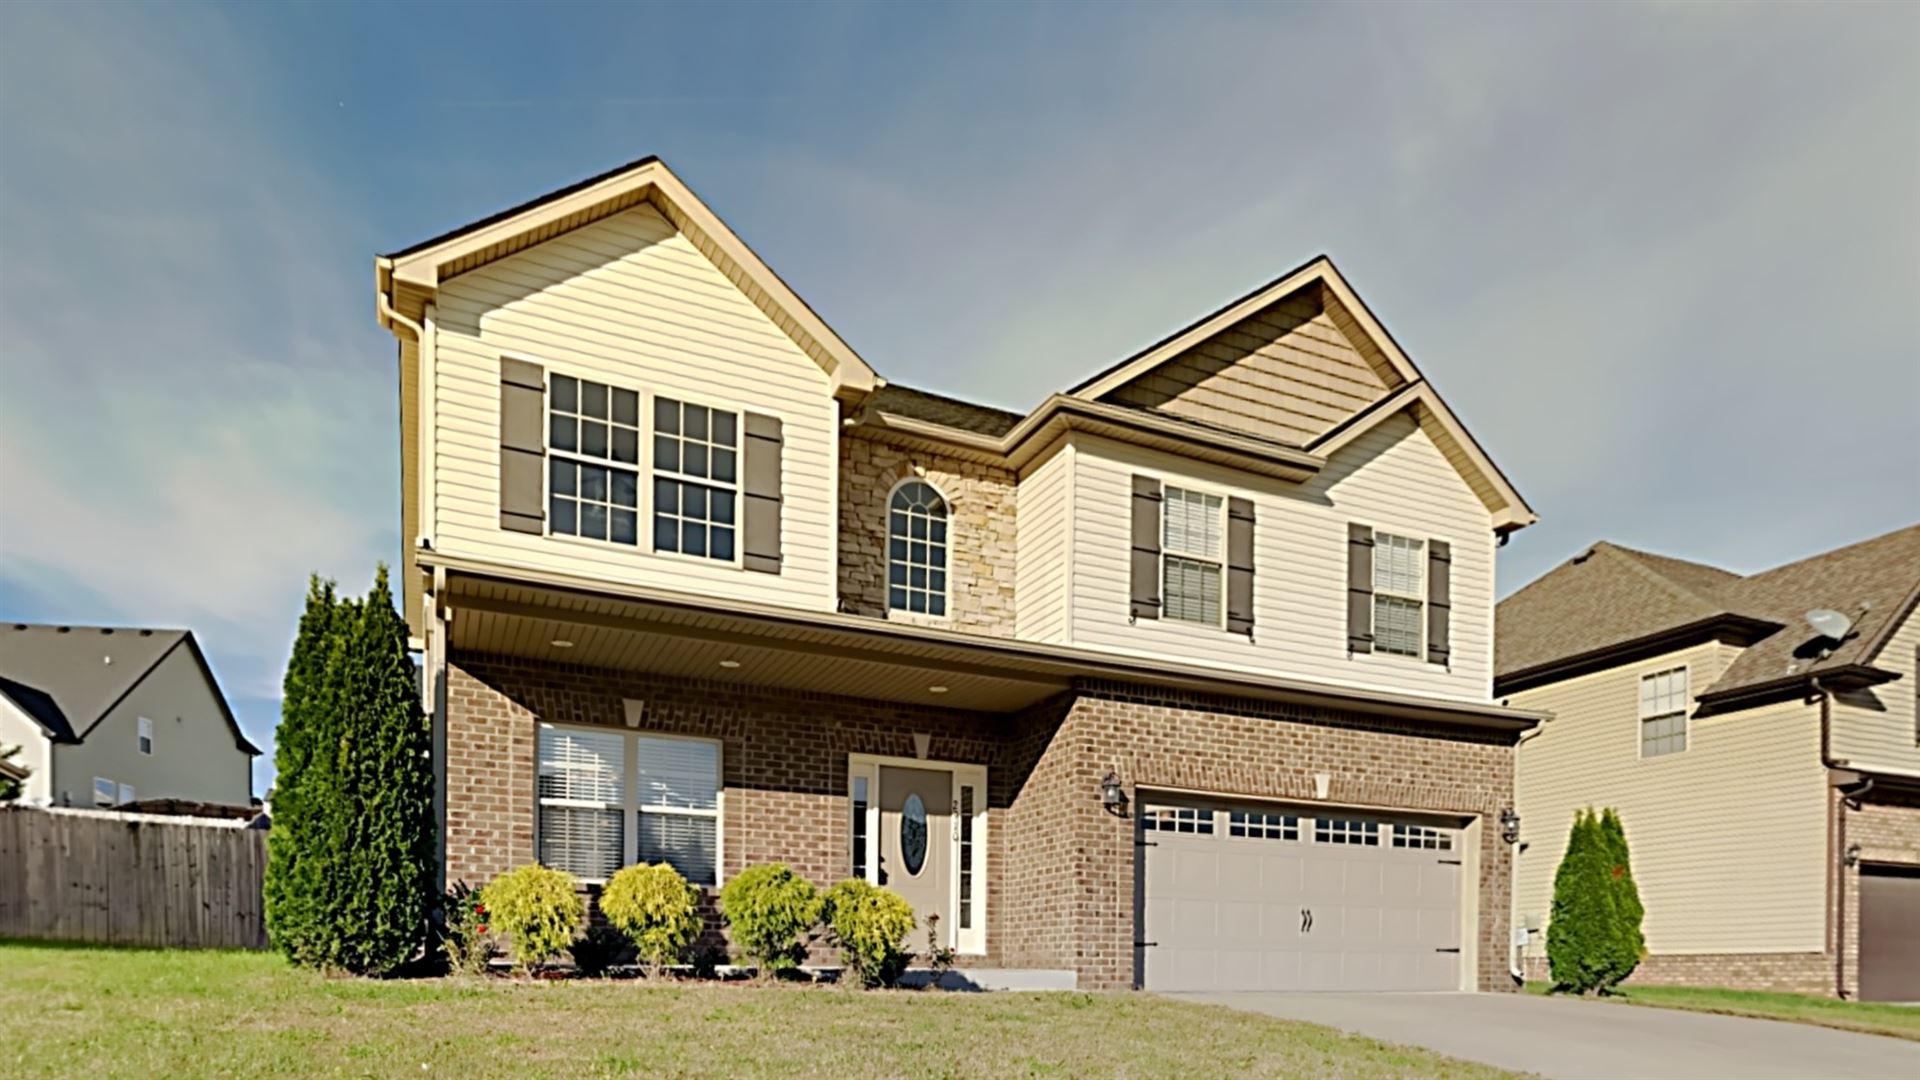 2910 McManus Cir, Clarksville, TN 37042 - MLS#: 2302547